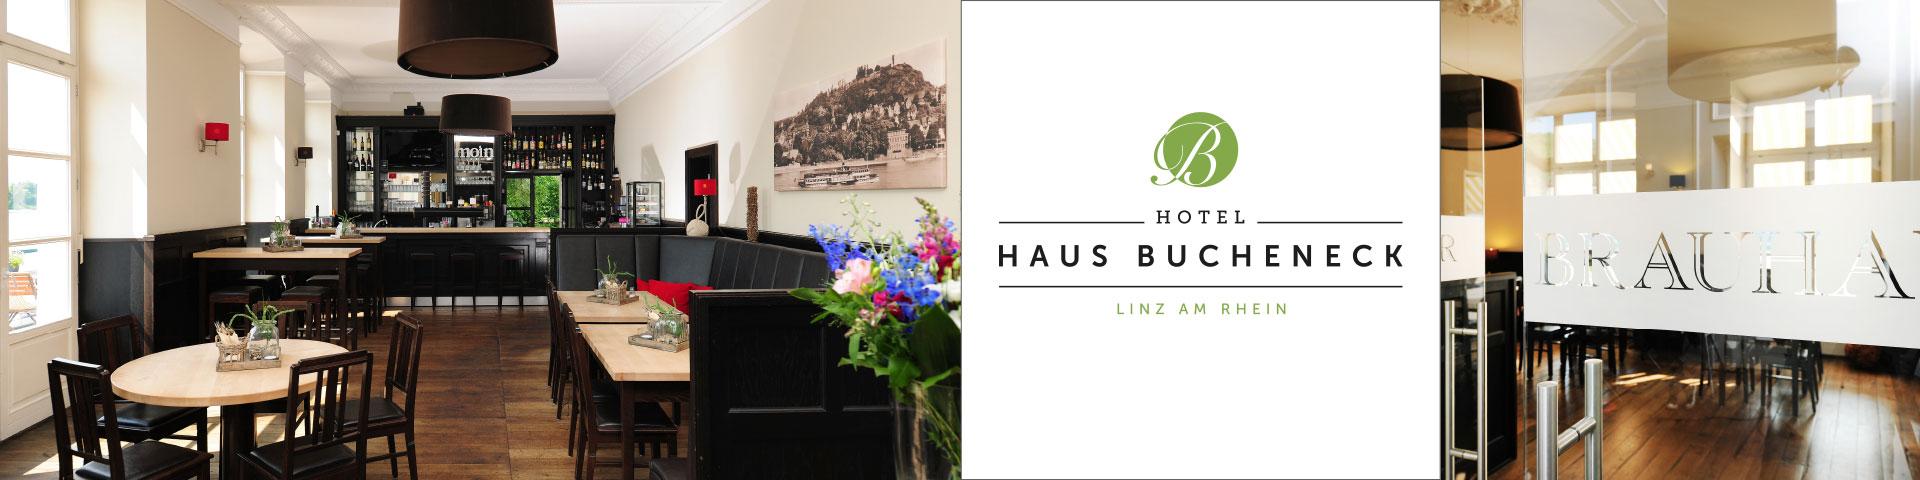 Projekte: website haus bucheneck - Logoentwicklung, Geschäftsausstattung, Flyer, Webseite